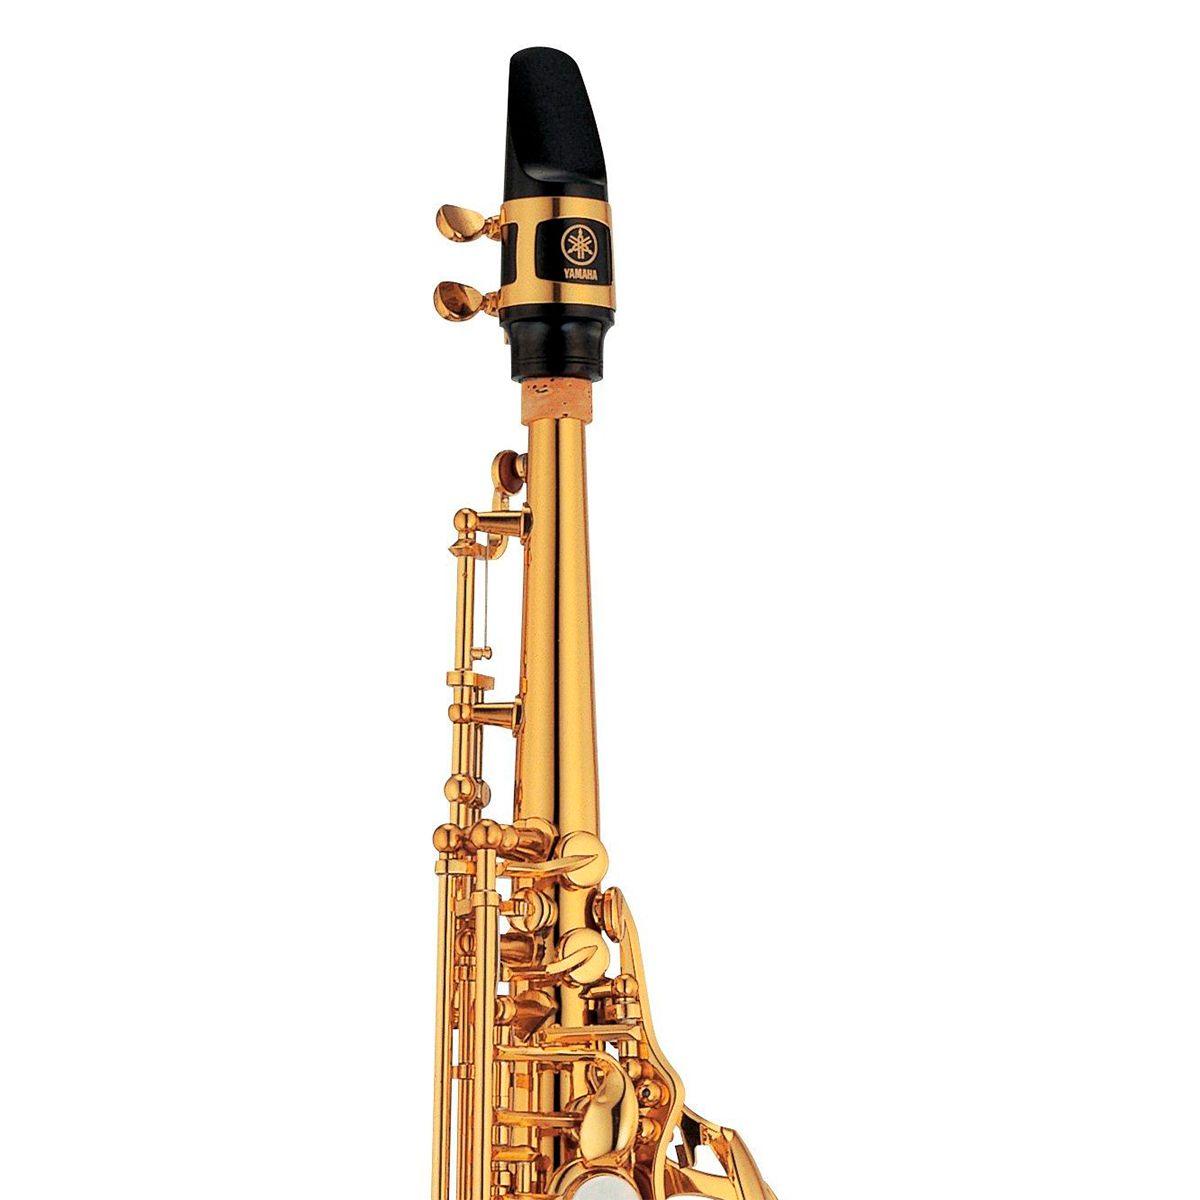 Saxofone Soprano Yamaha YSS457 II Bb Laqueado Dourado com Case